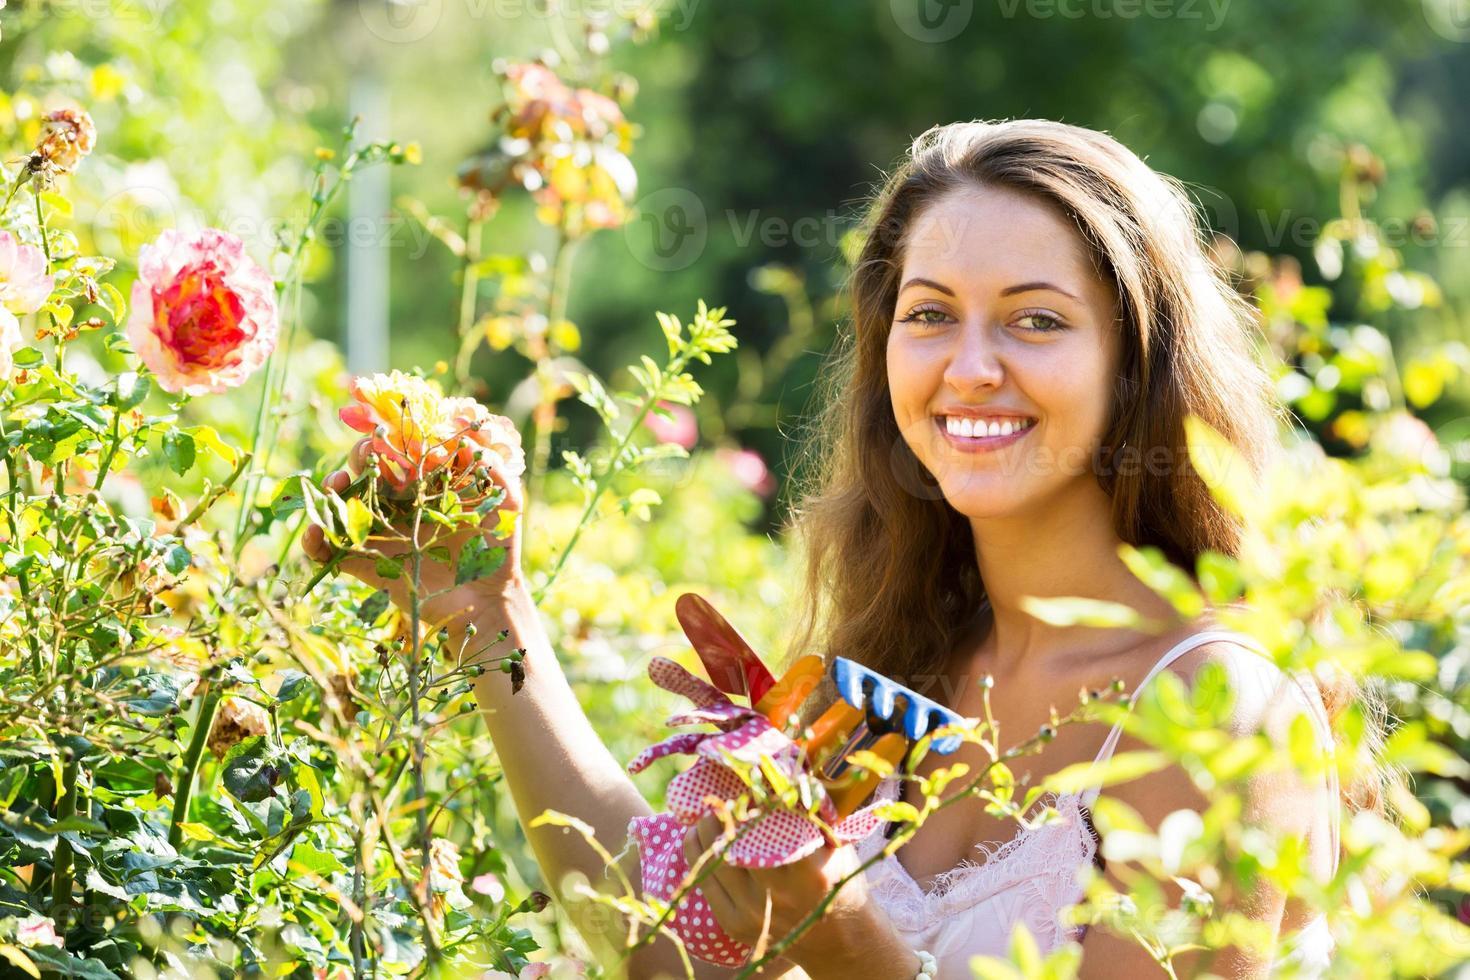 Floristin im Sommergarten foto